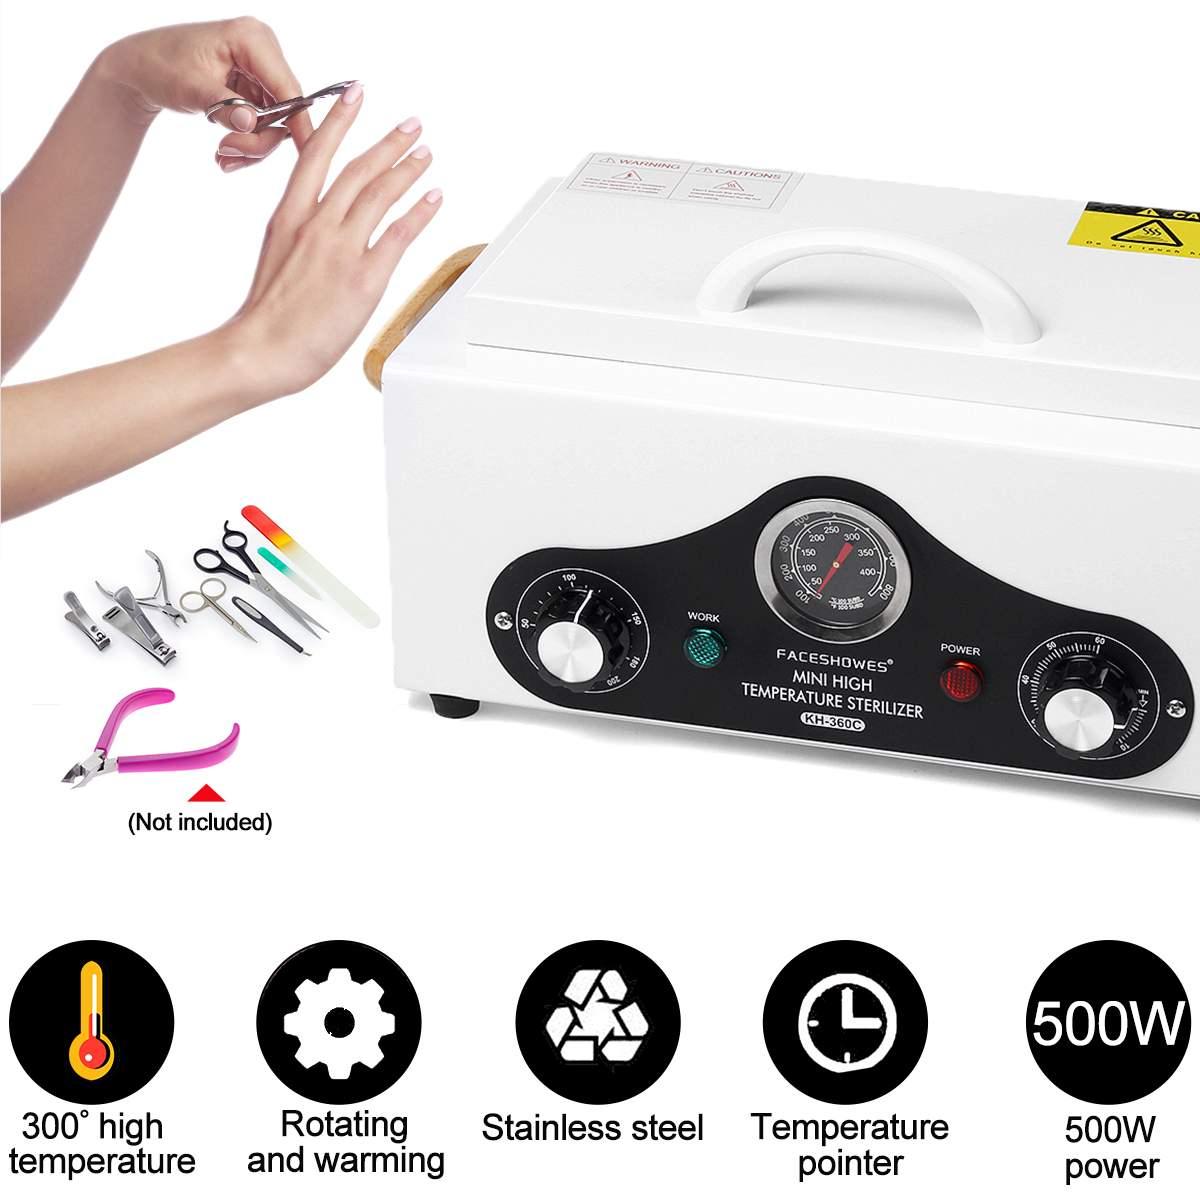 500W 300 Centigrade Box UV Sterilizer Box Nail Art Equipment Salon Sterilizing Tool Manicure Nail Tool Dry Heat Sterilizer